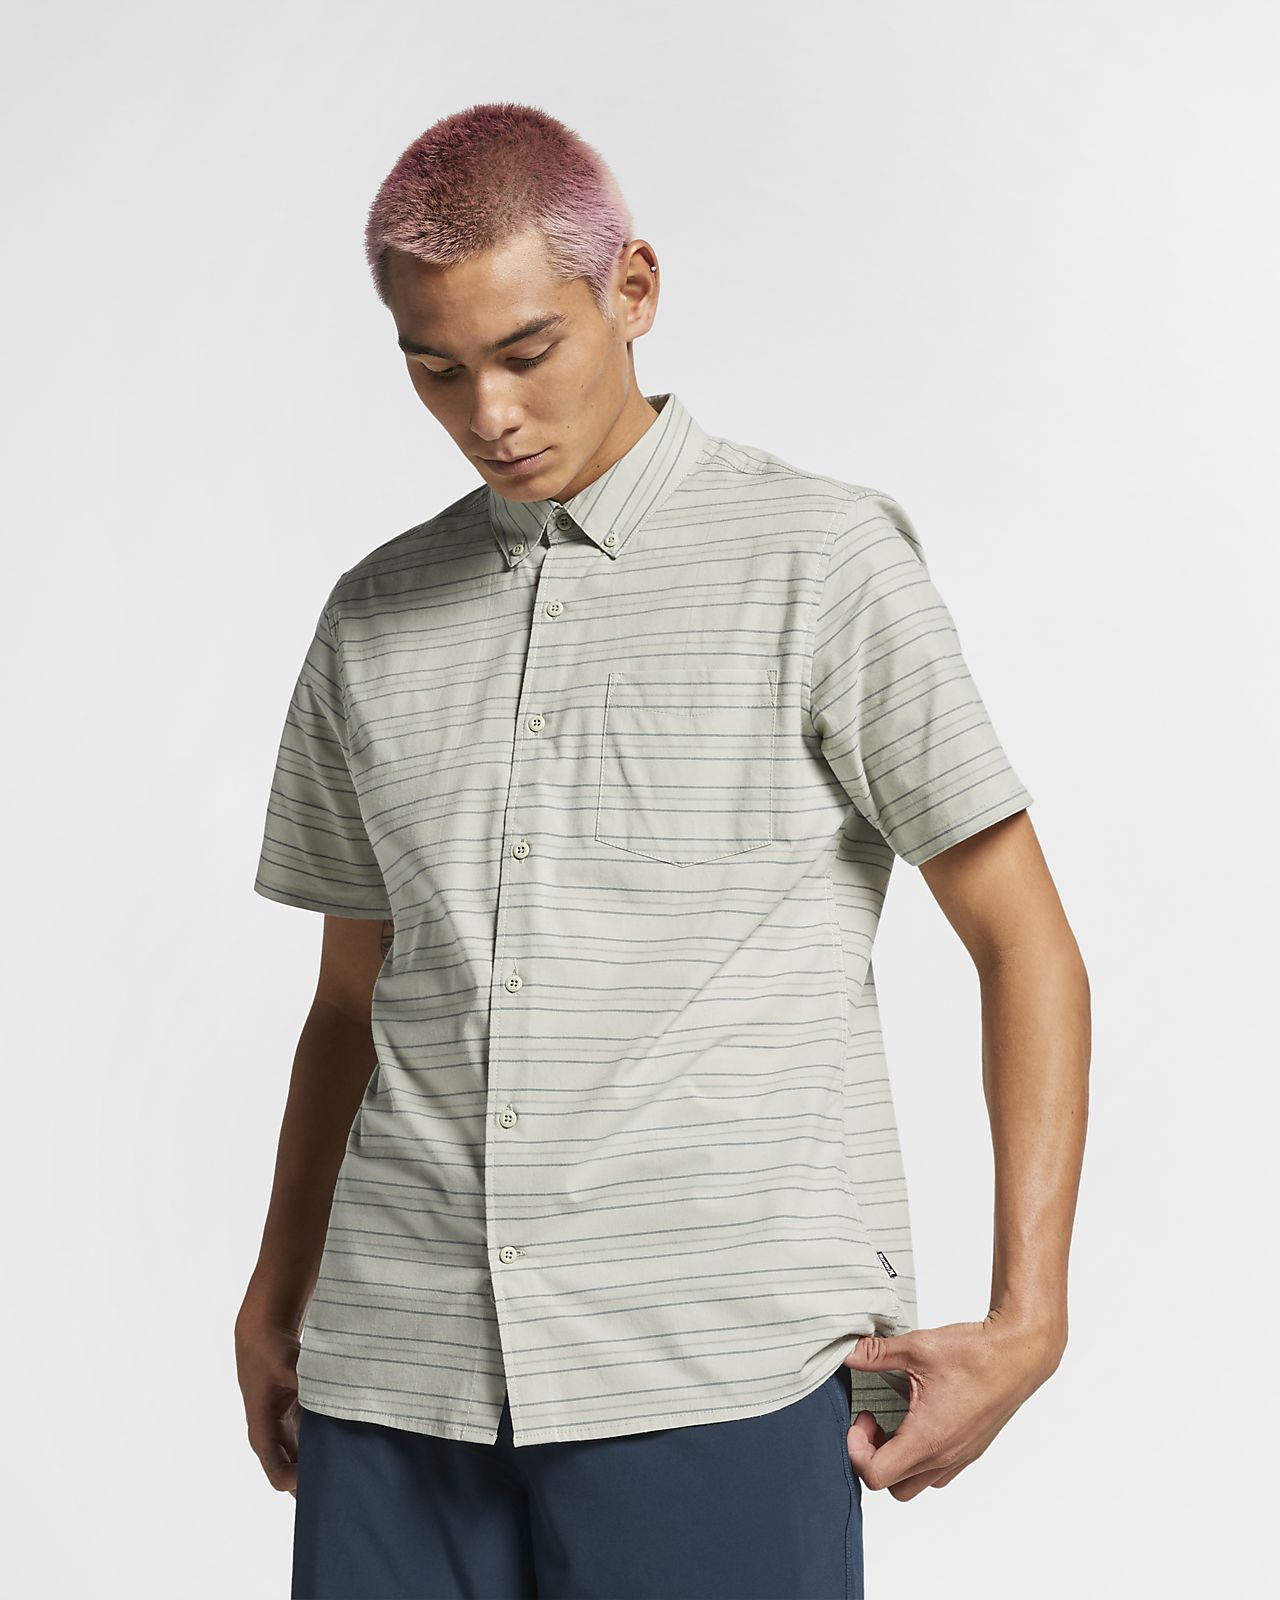 Hurley Dri-FIT Staycay Camisa de manga corta - Hombre